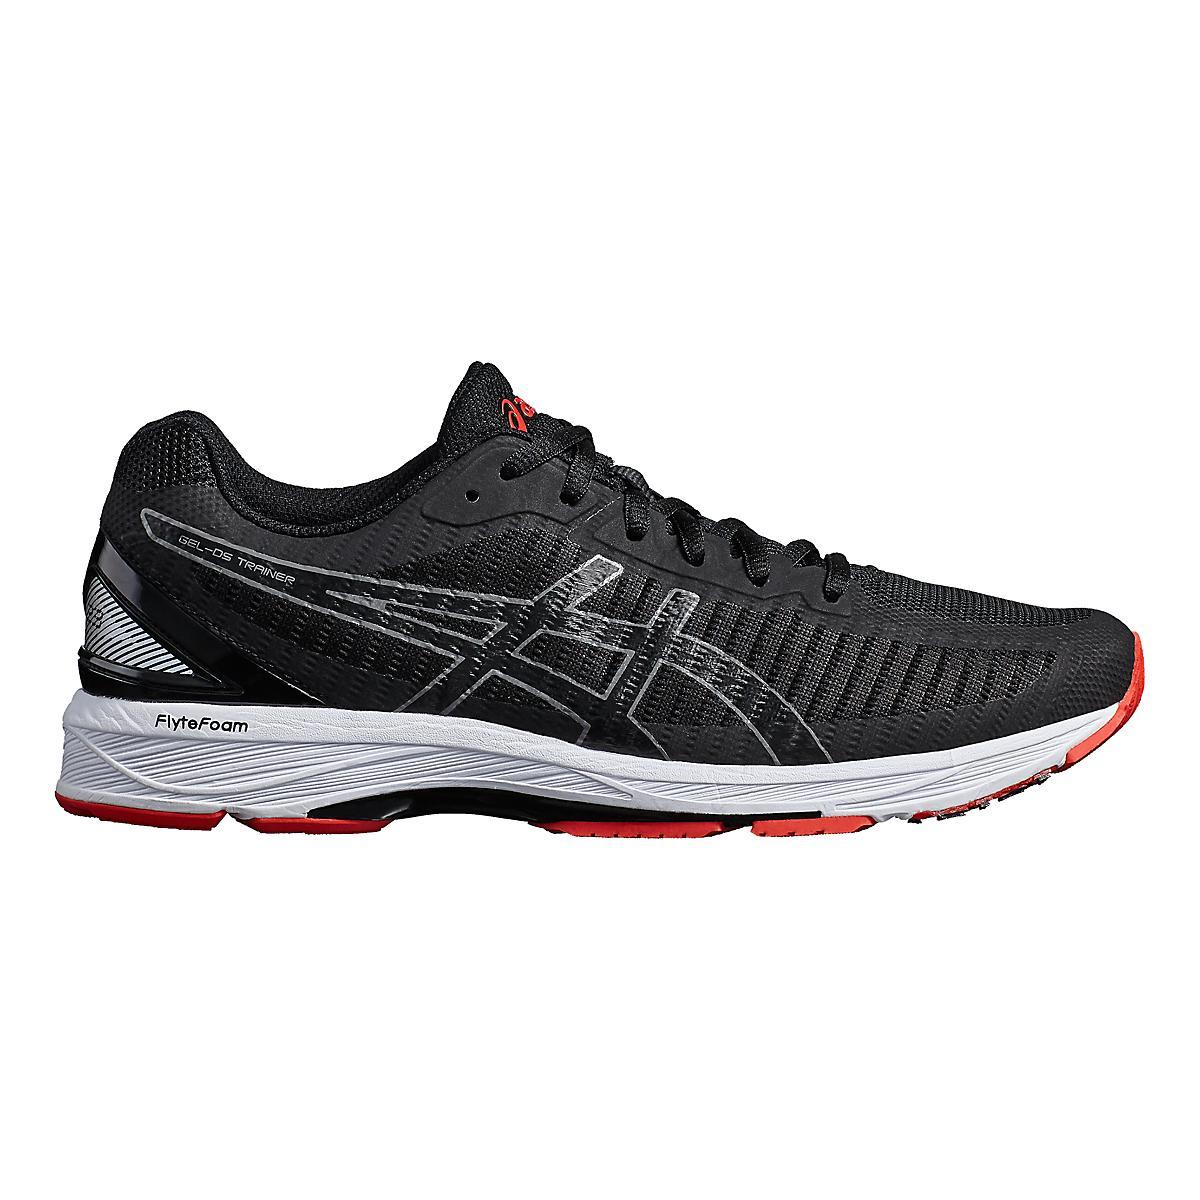 3ca6d2466 Mens ASICS GEL-DS Trainer 23 Running Shoe at Road Runner Sports